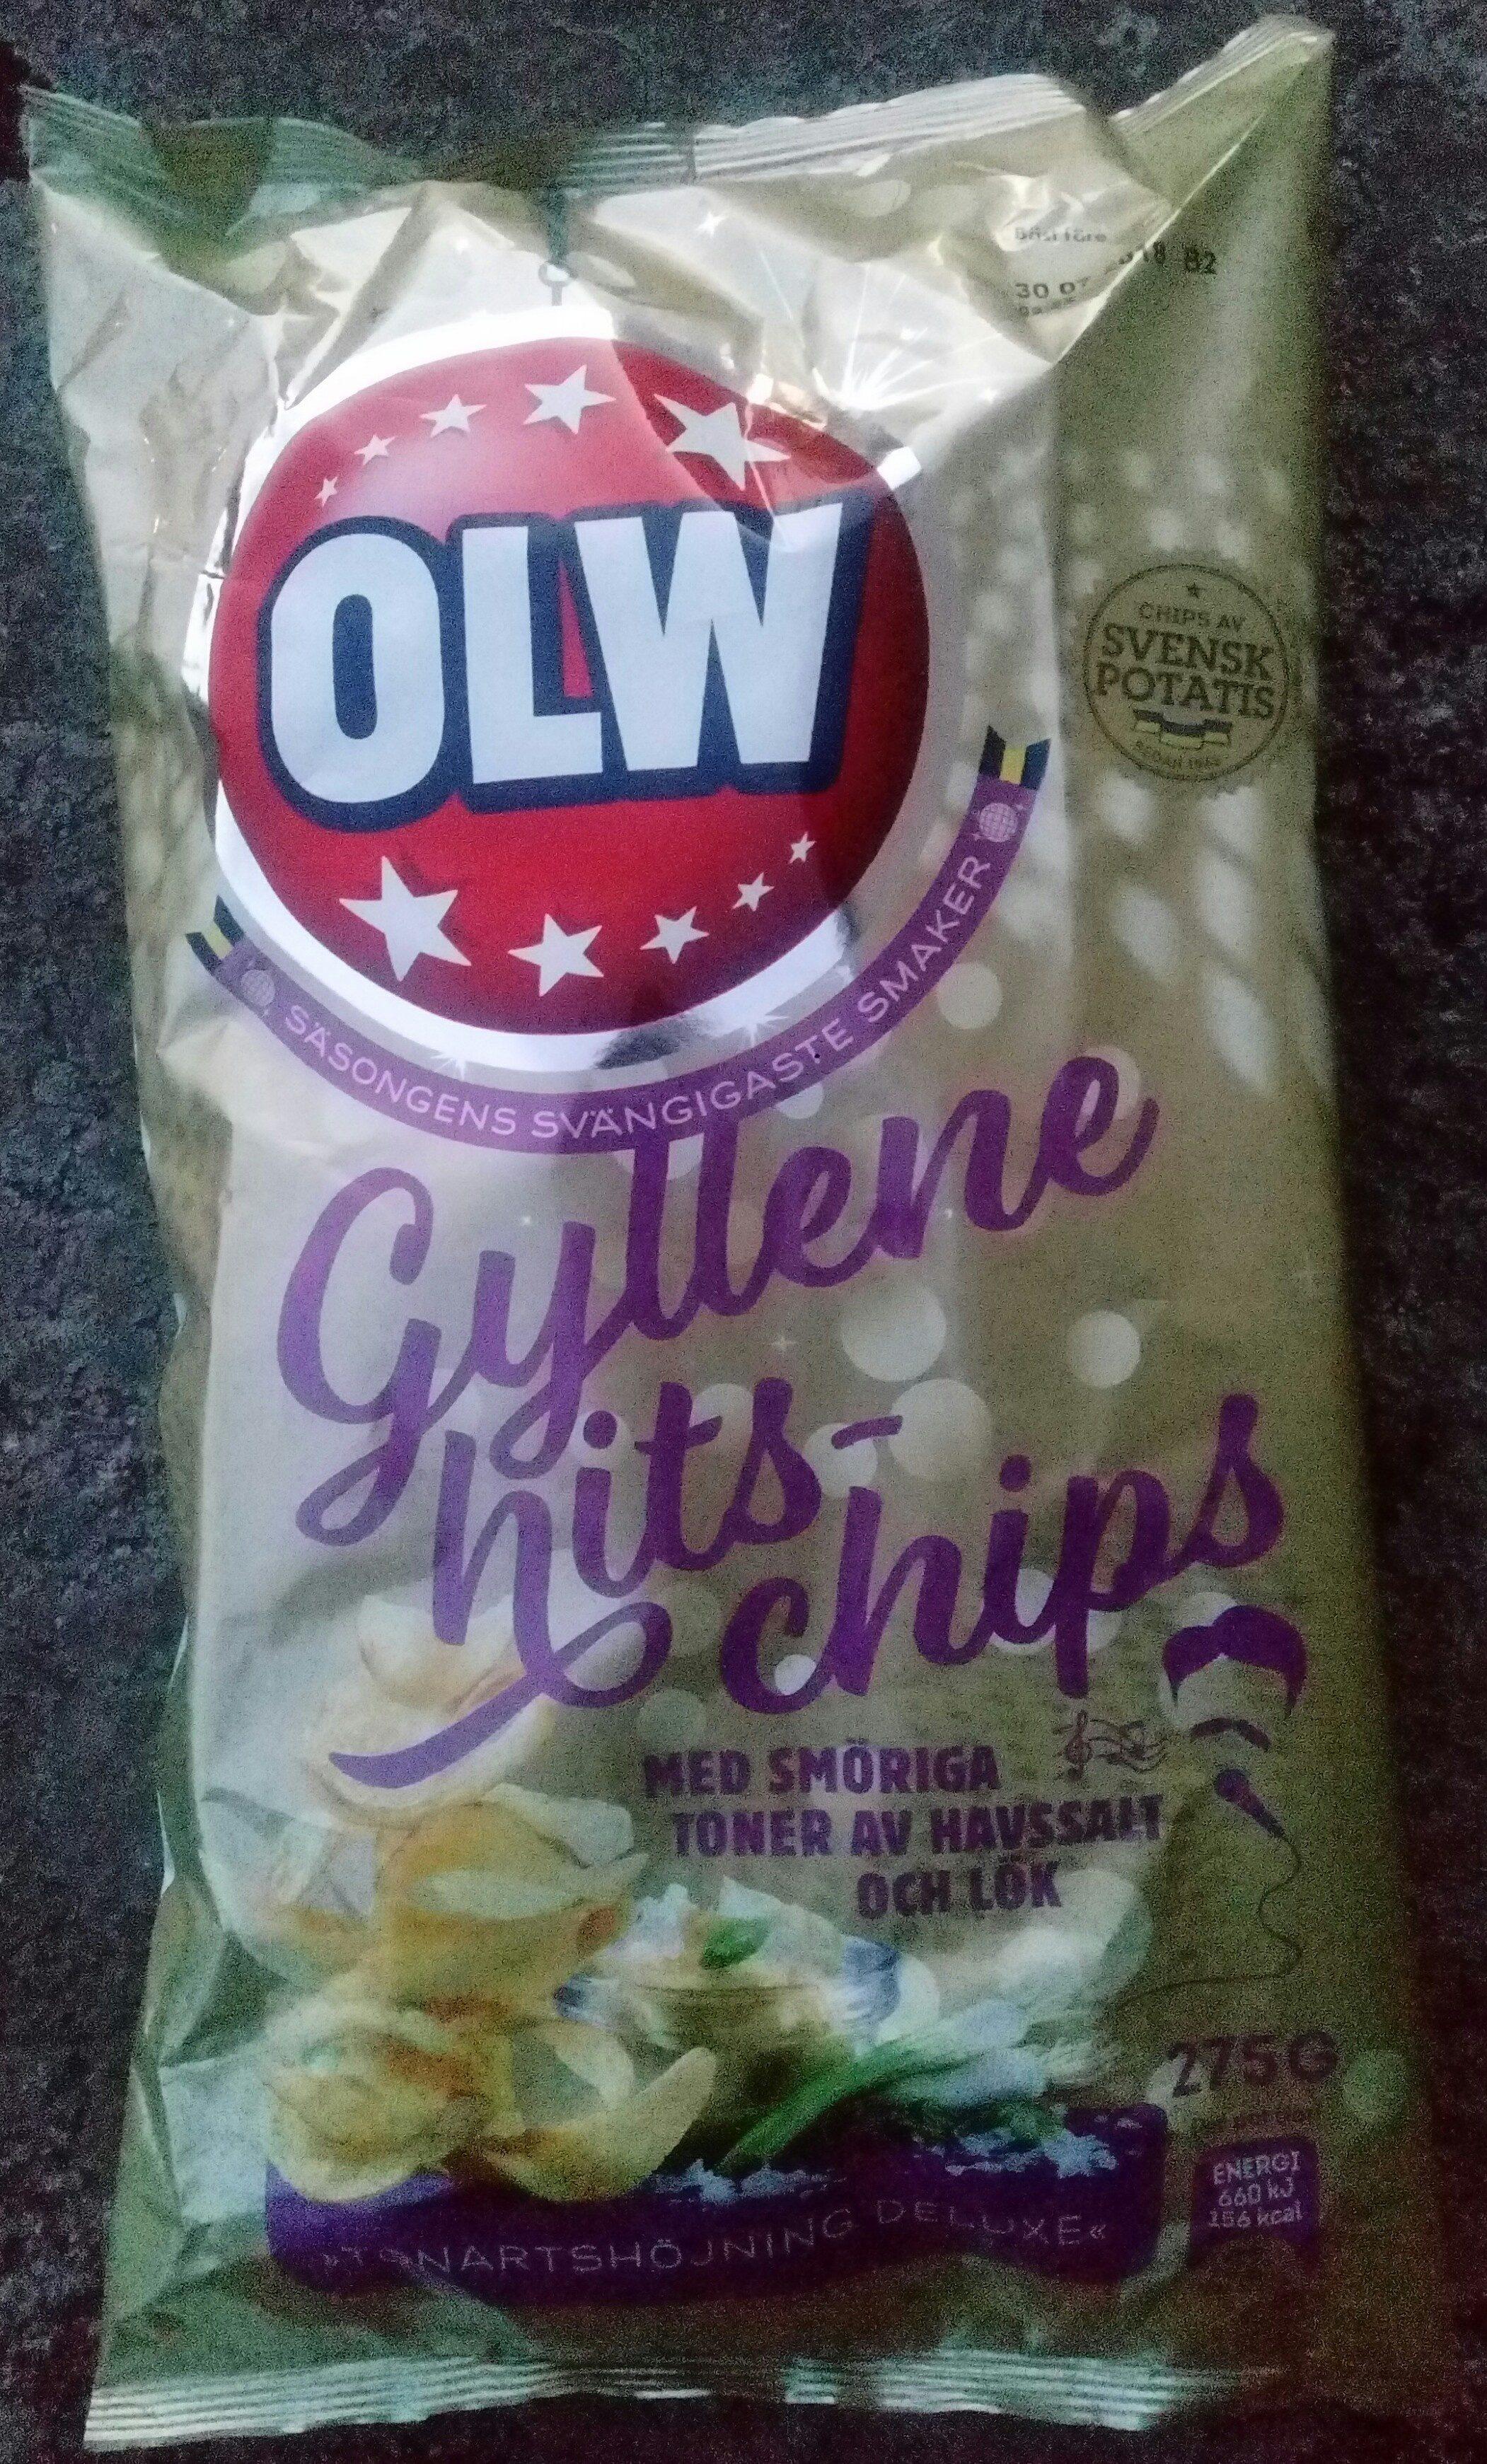 OLW Gyllene hits-chips - Product - sv